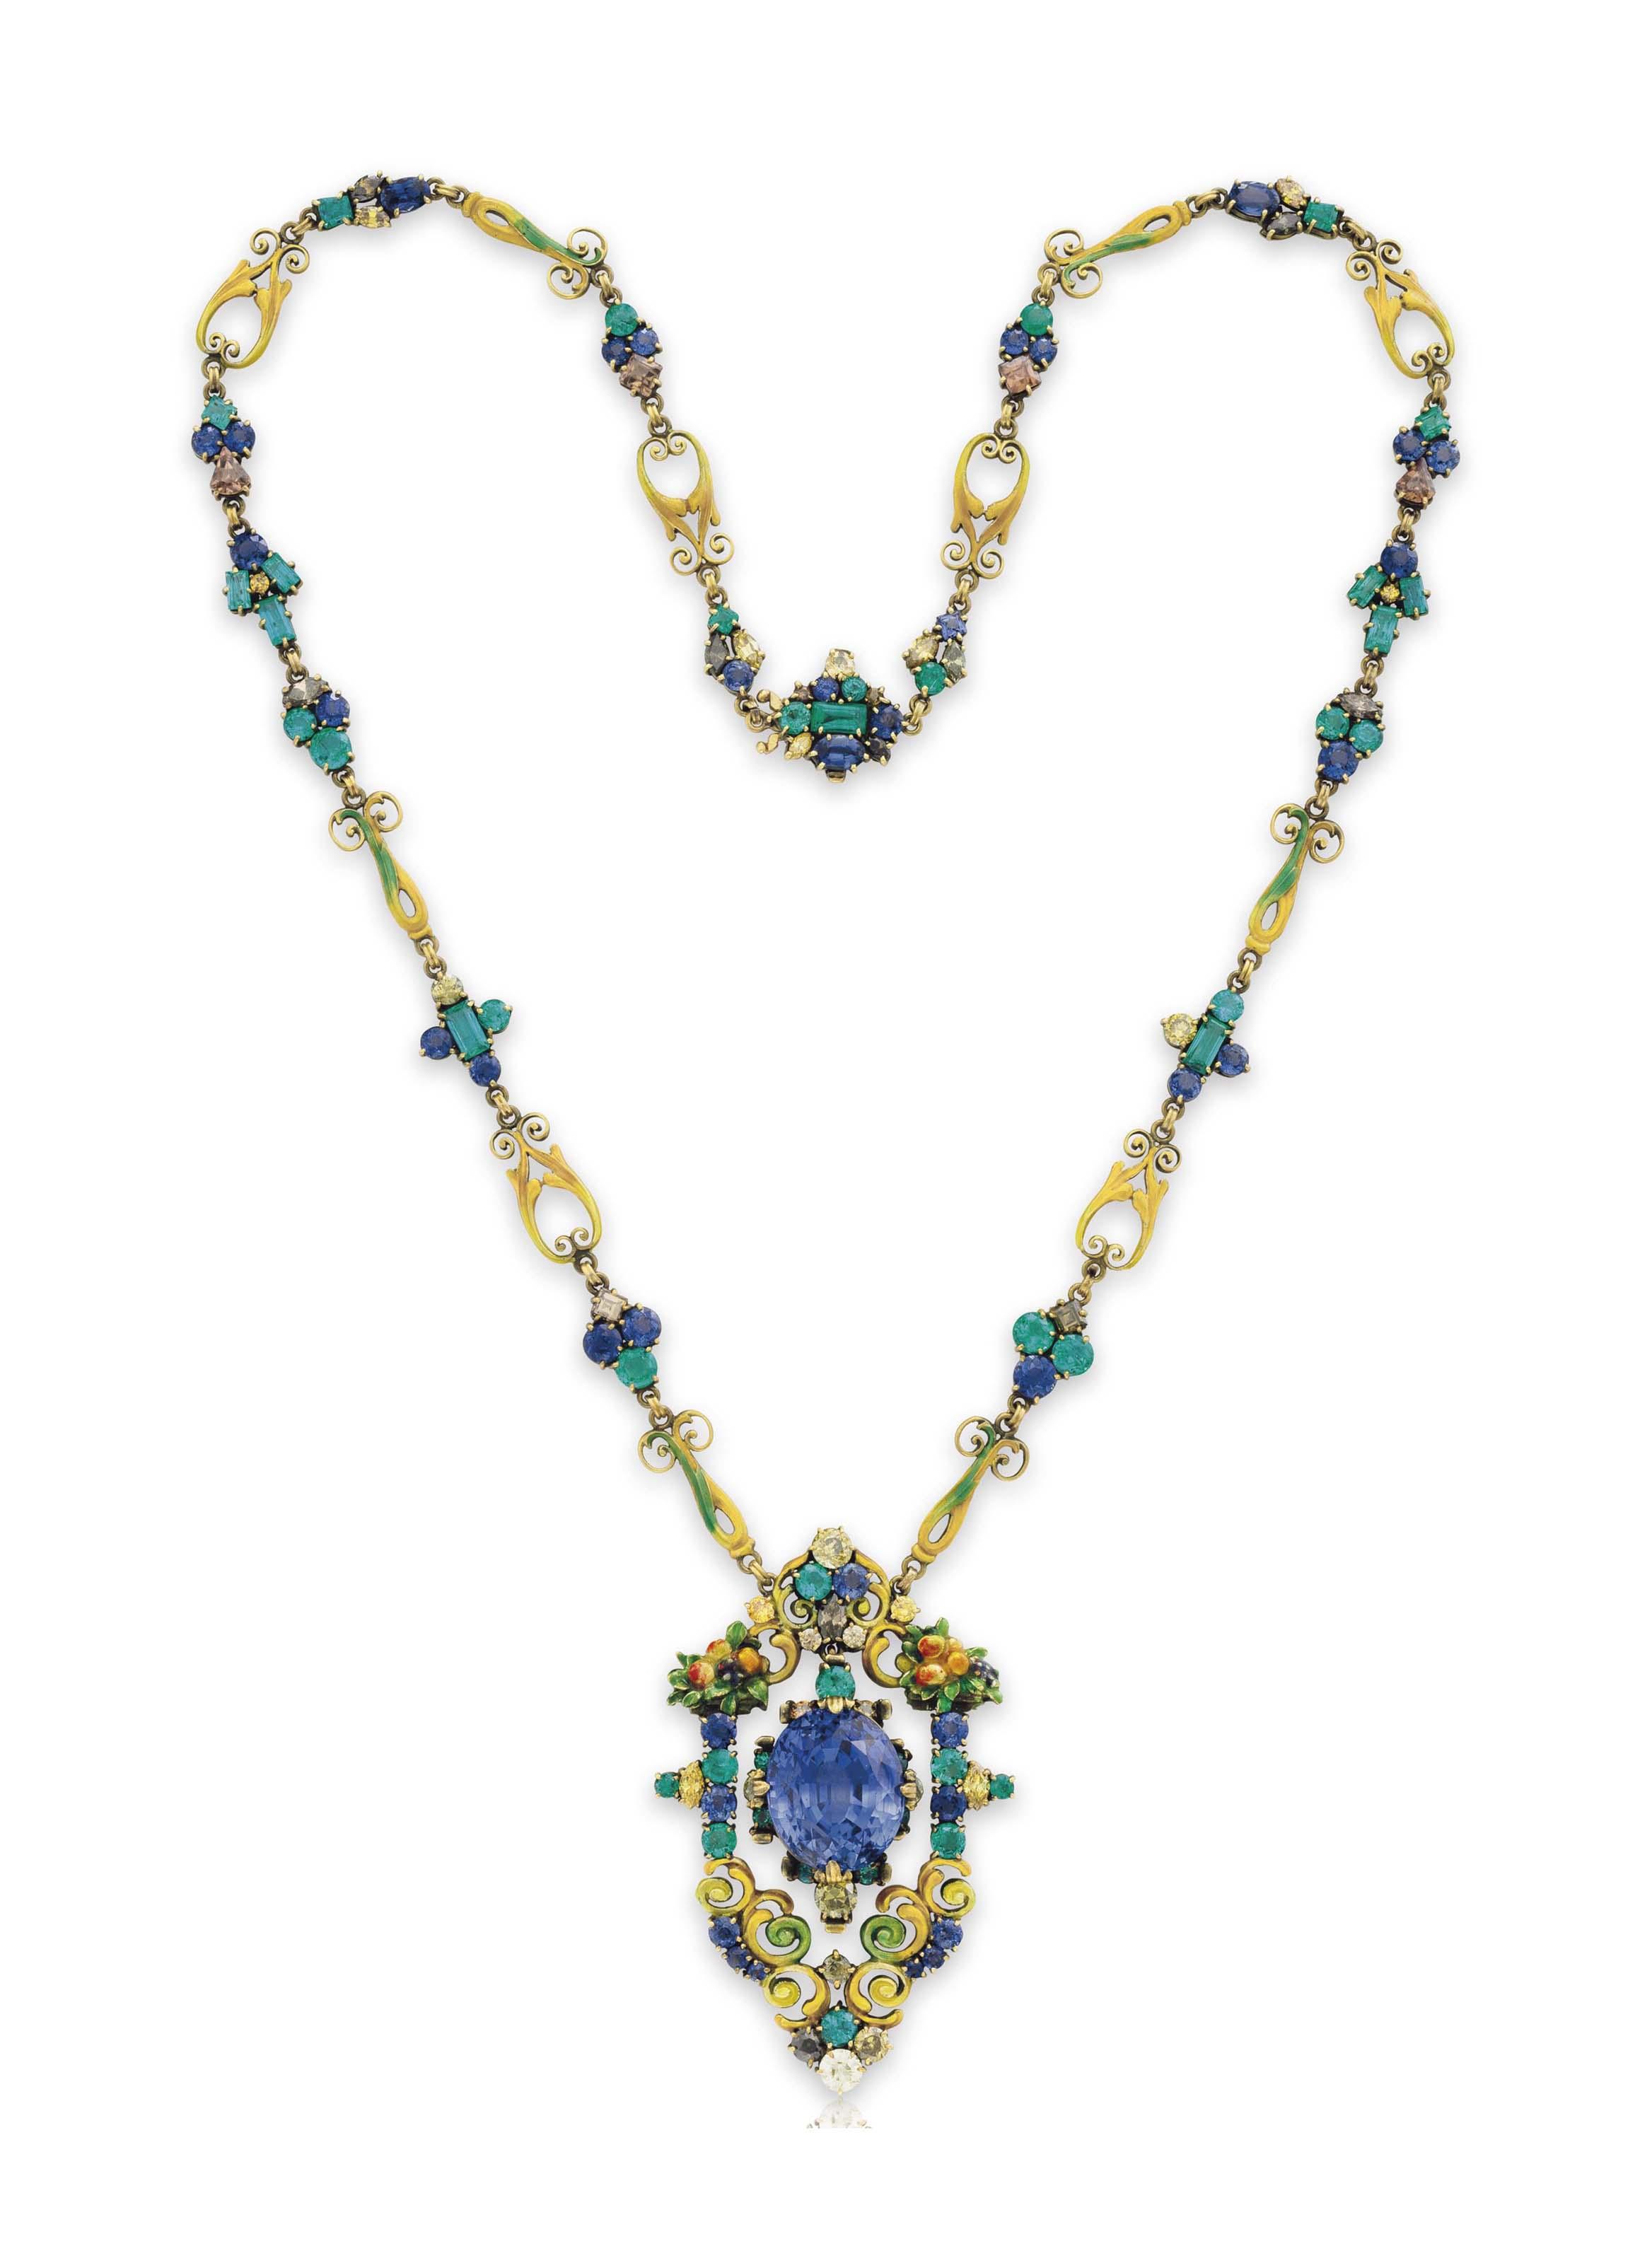 A Multi Gem Pendant Necklace By Louis Comfort Tiffany